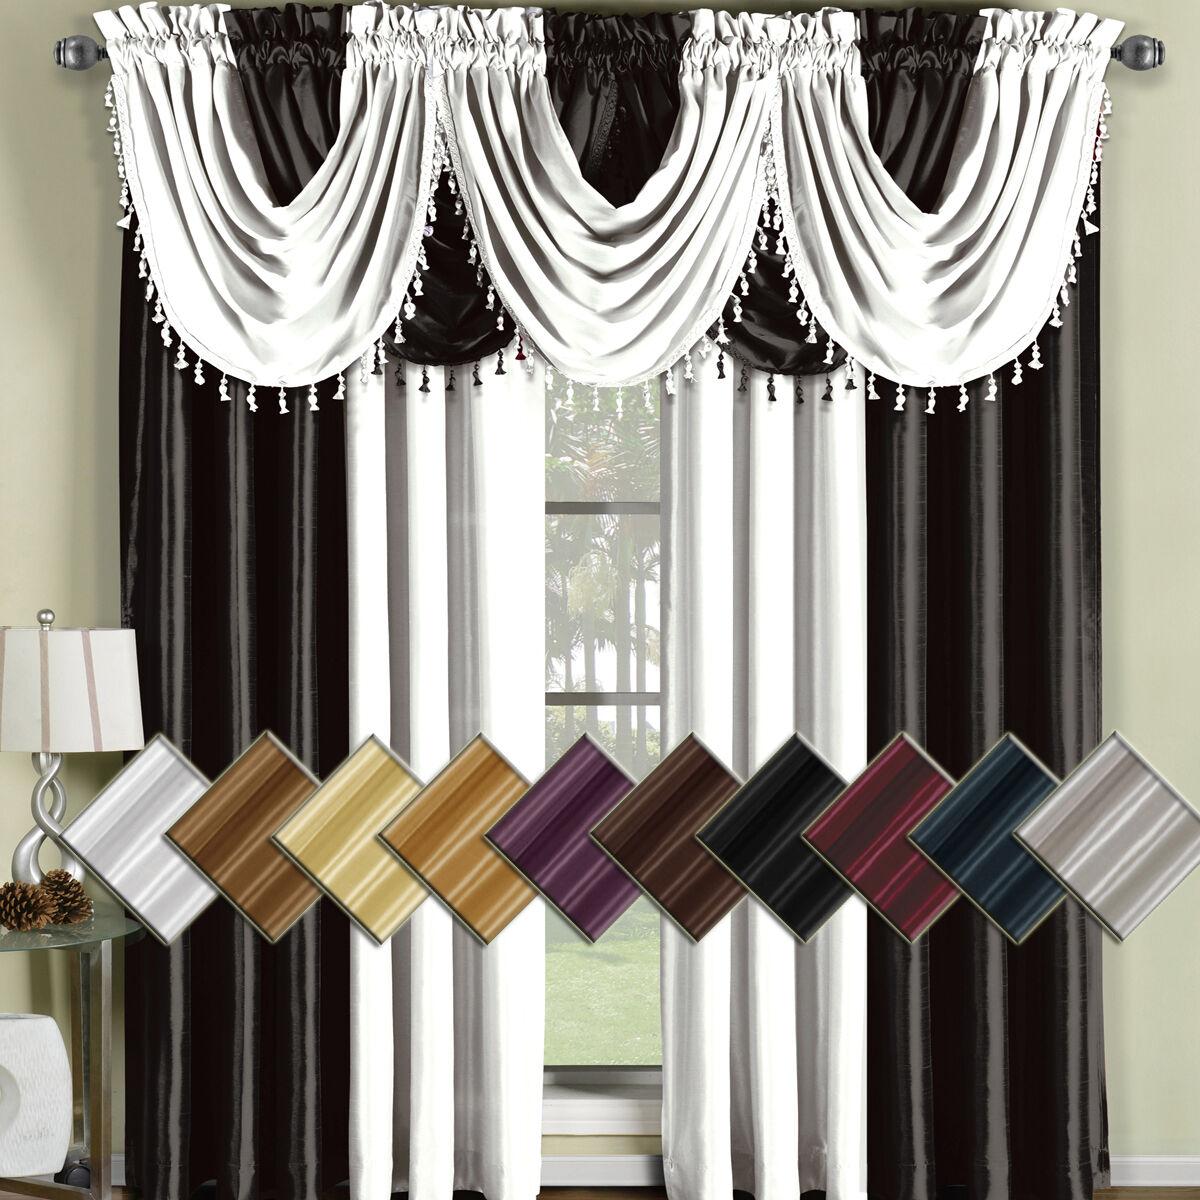 Soho Rod Faux Silk Waterfall Window Treatment Includes 4